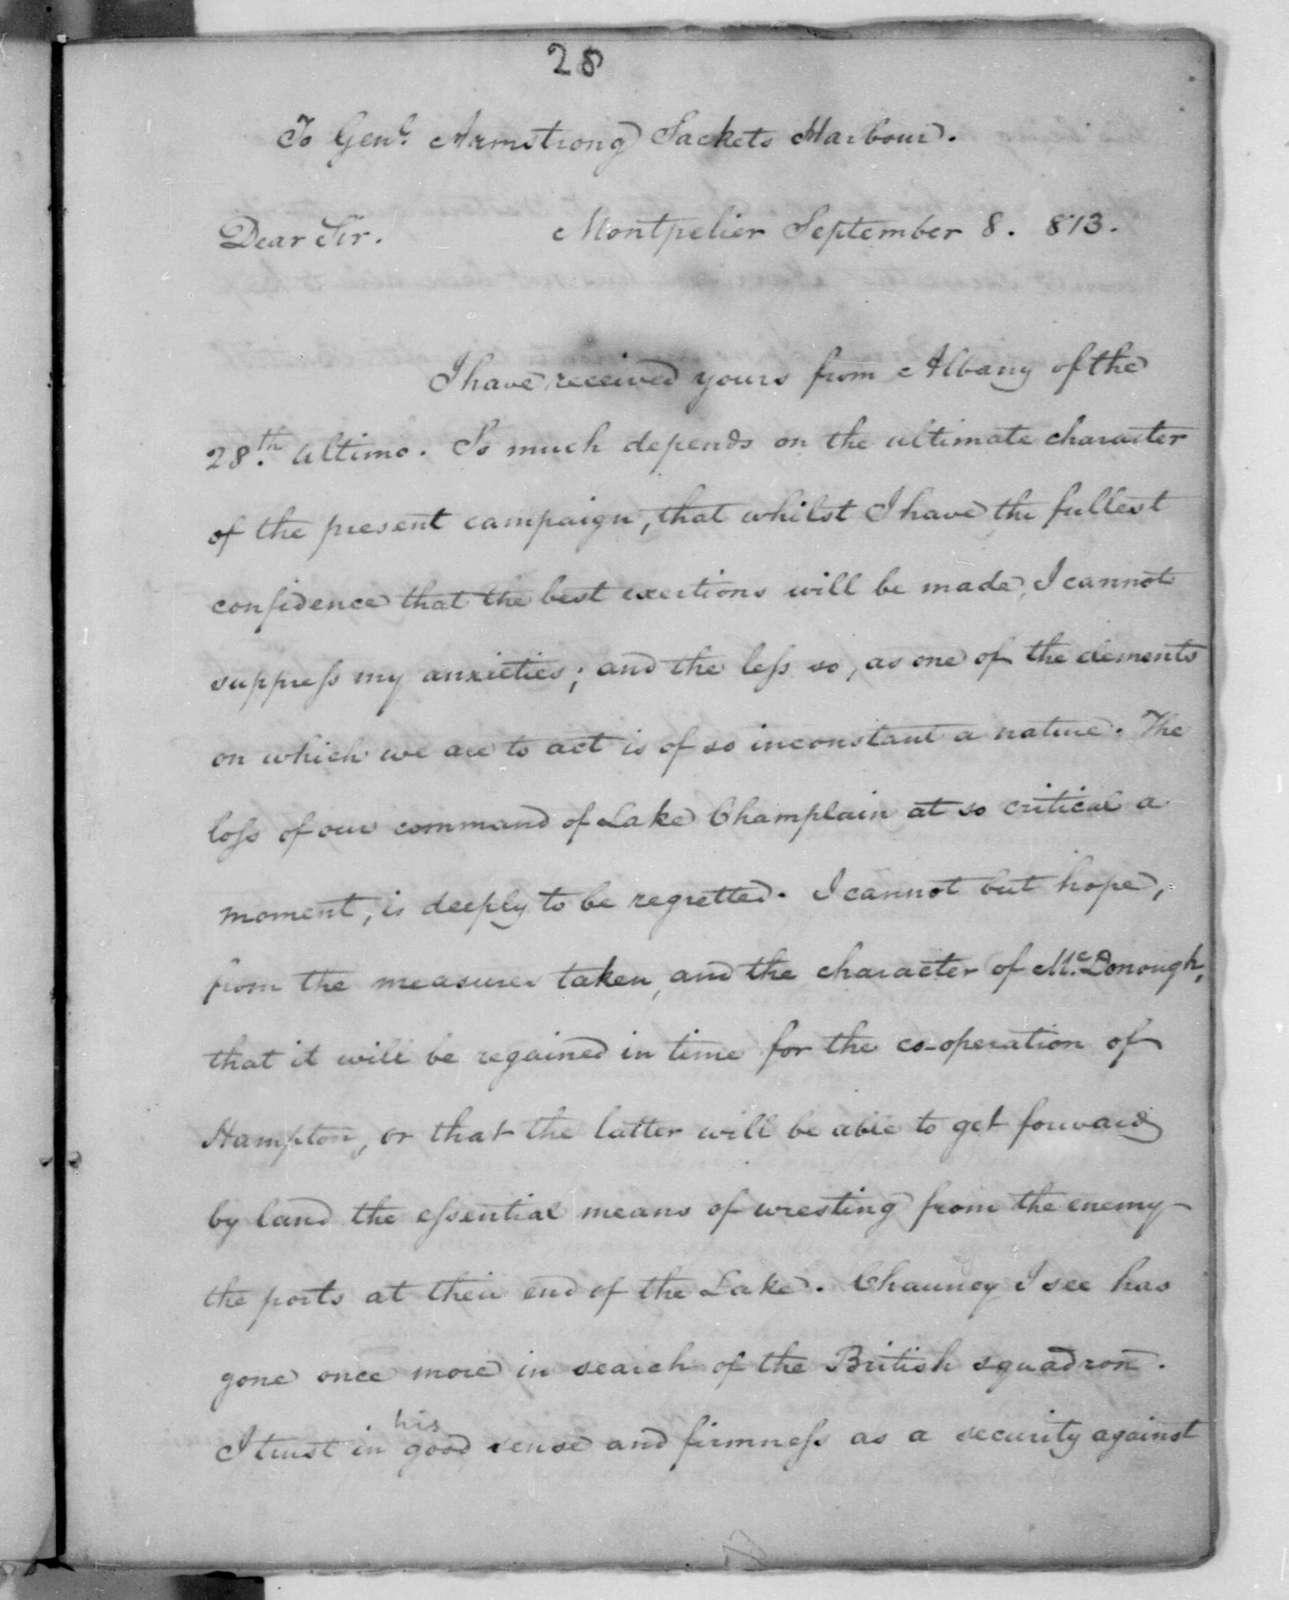 James Madison to John Armstrong, September 8, 1813.